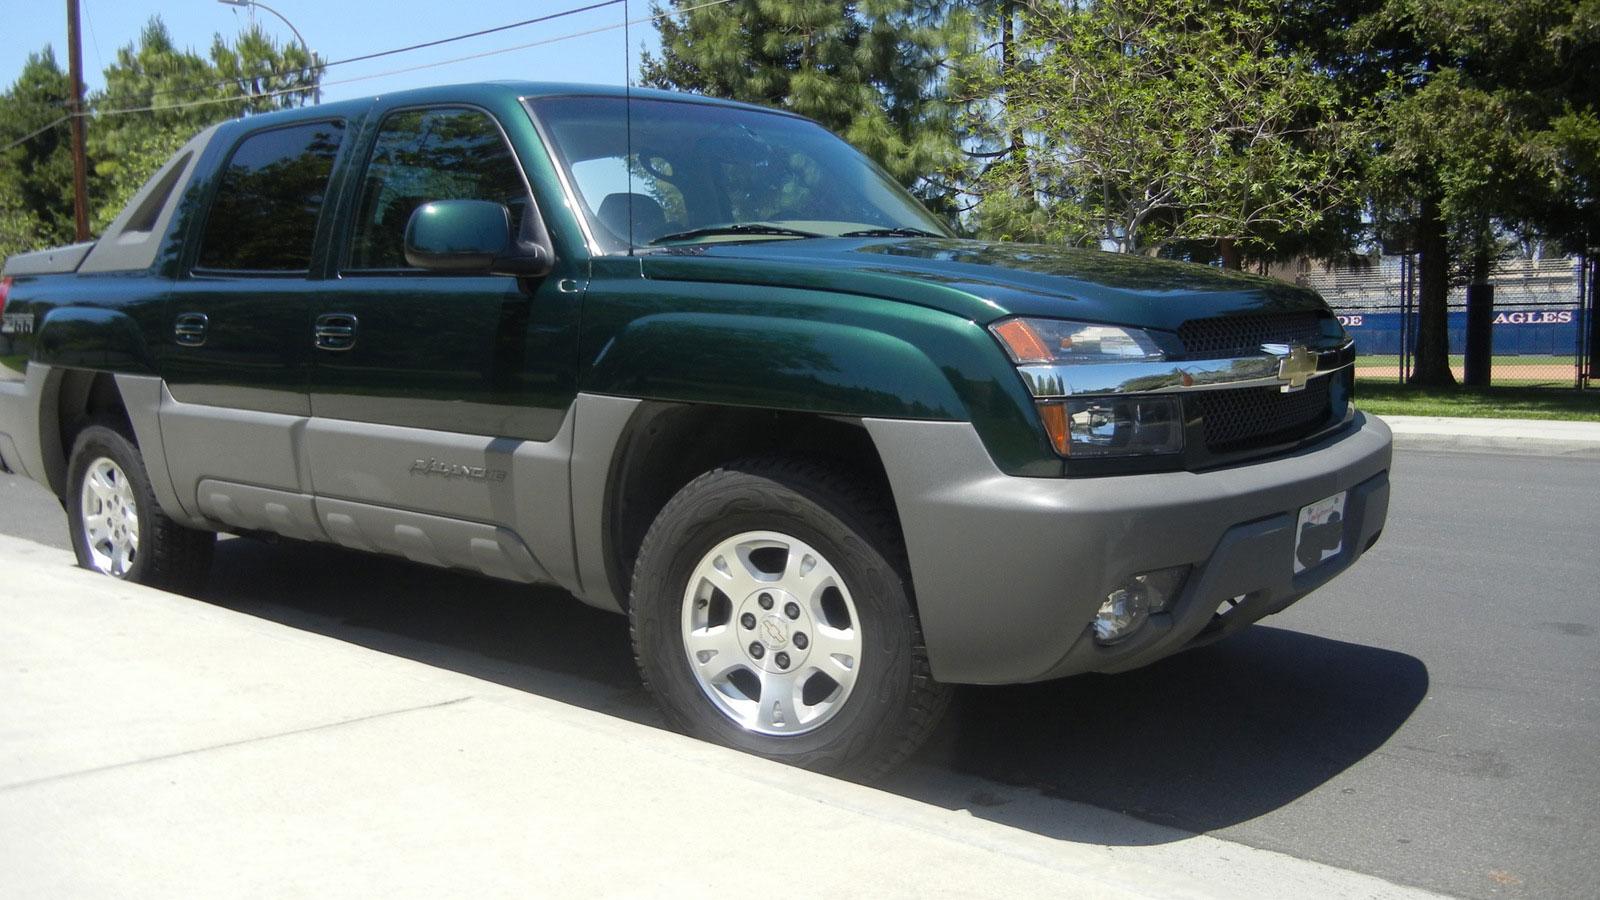 2002 Chevrolet Avalanche - Pictures - CarGurus